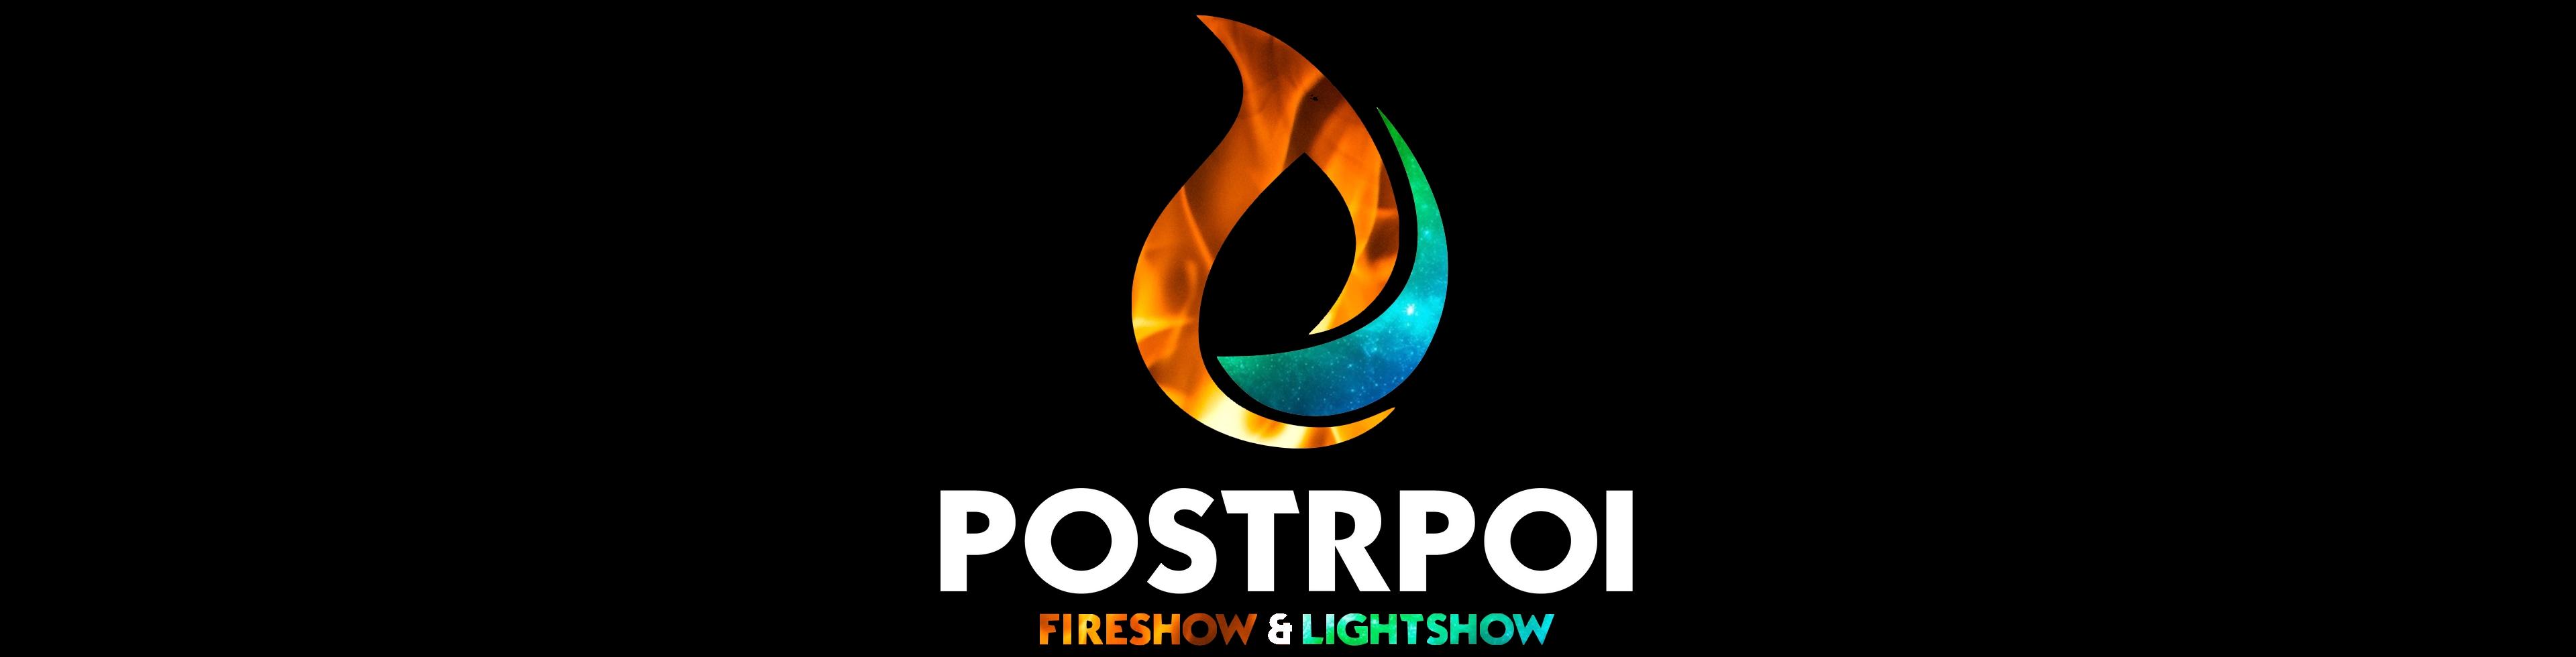 Postrpoi - Fireshow a Lighshow představení